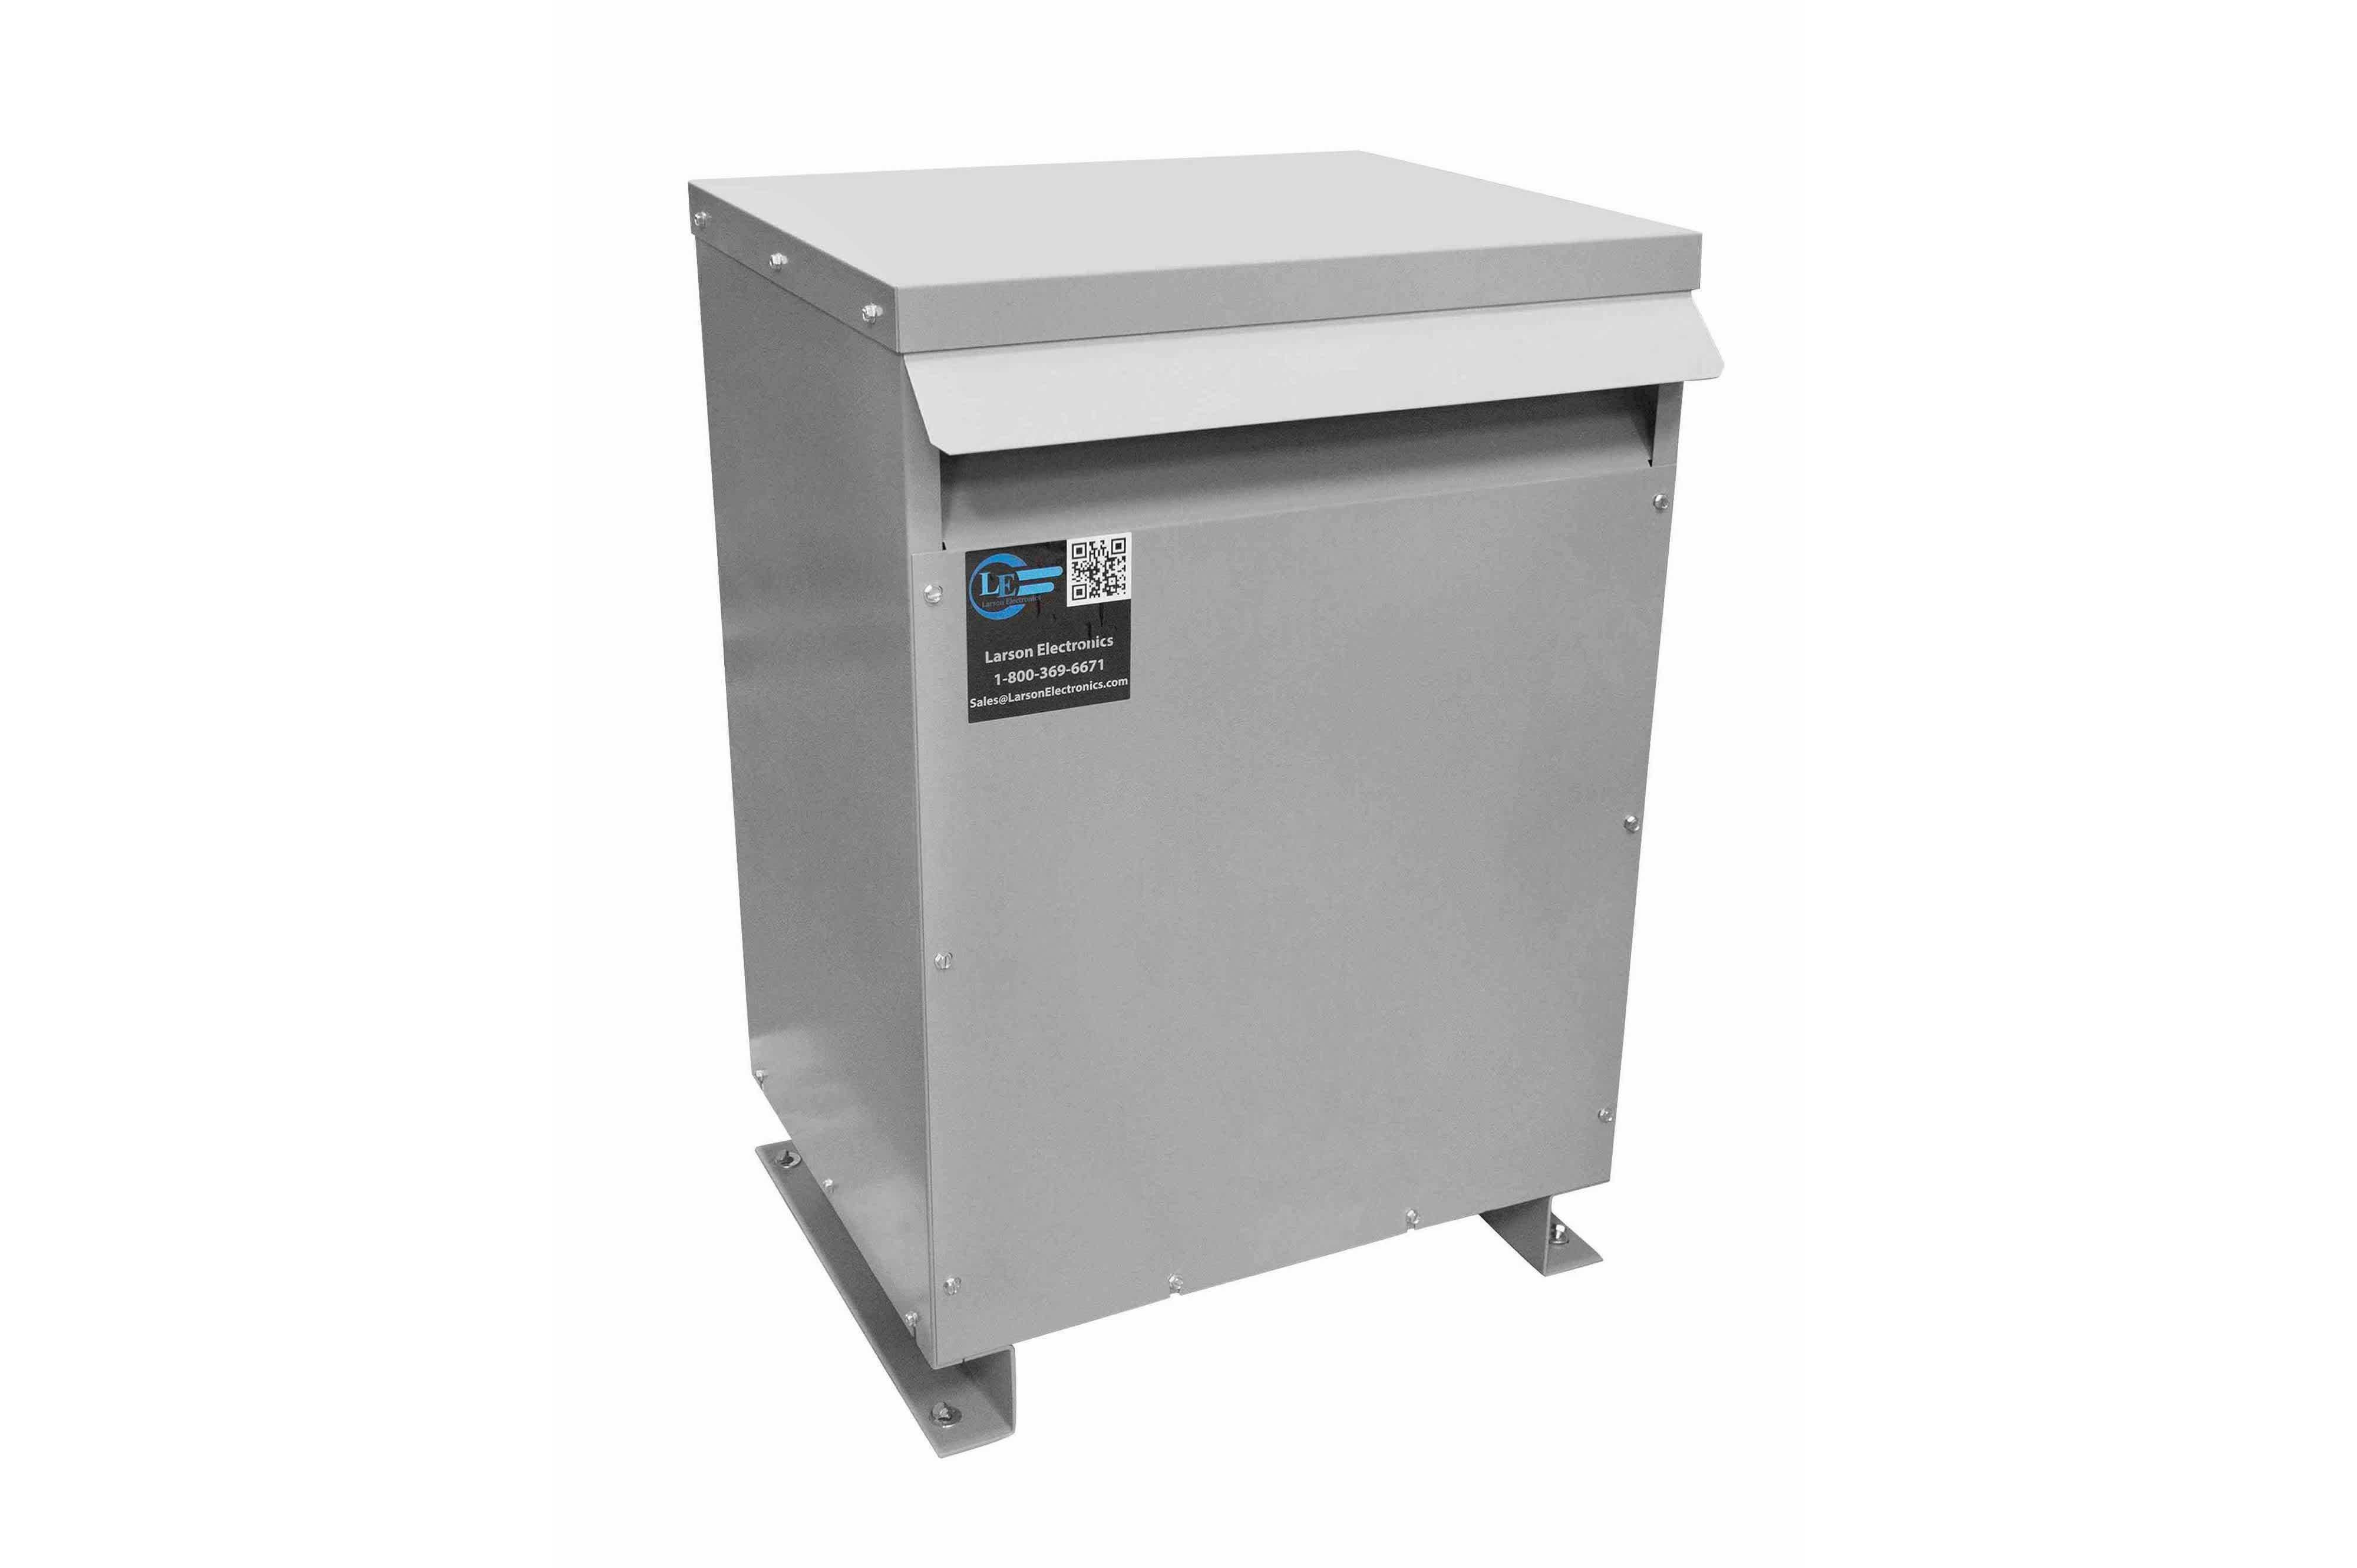 167 kVA 3PH DOE Transformer, 415V Delta Primary, 600Y/347 Wye-N Secondary, N3R, Ventilated, 60 Hz